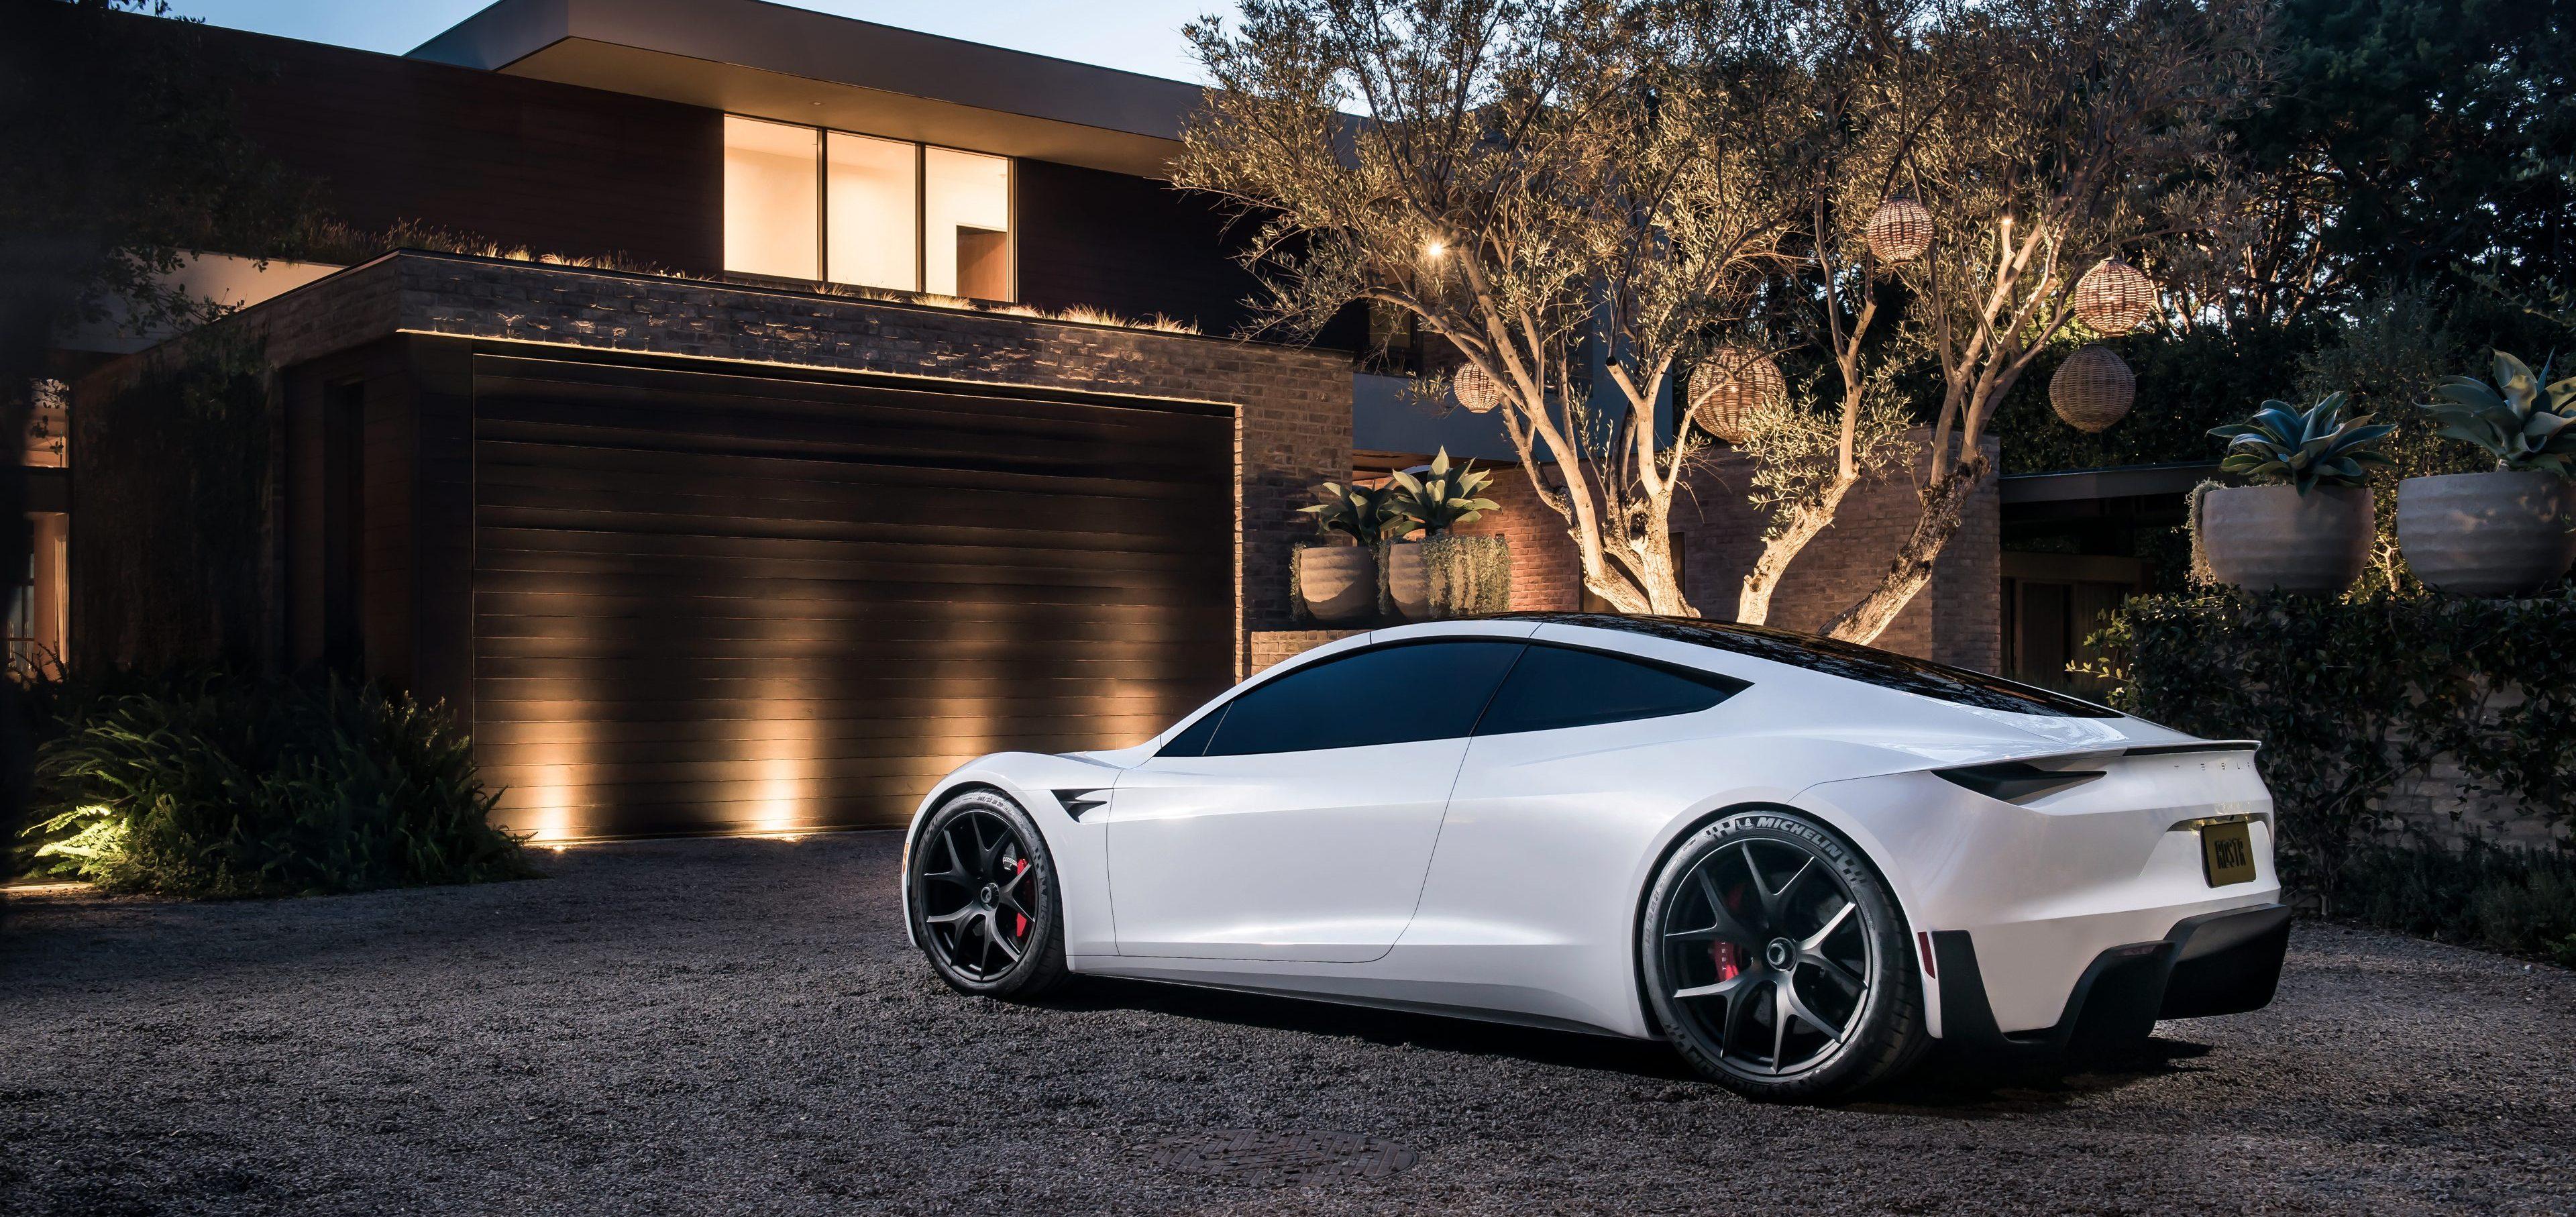 Tesla Image: Tesla Releases New Roadster Pictures